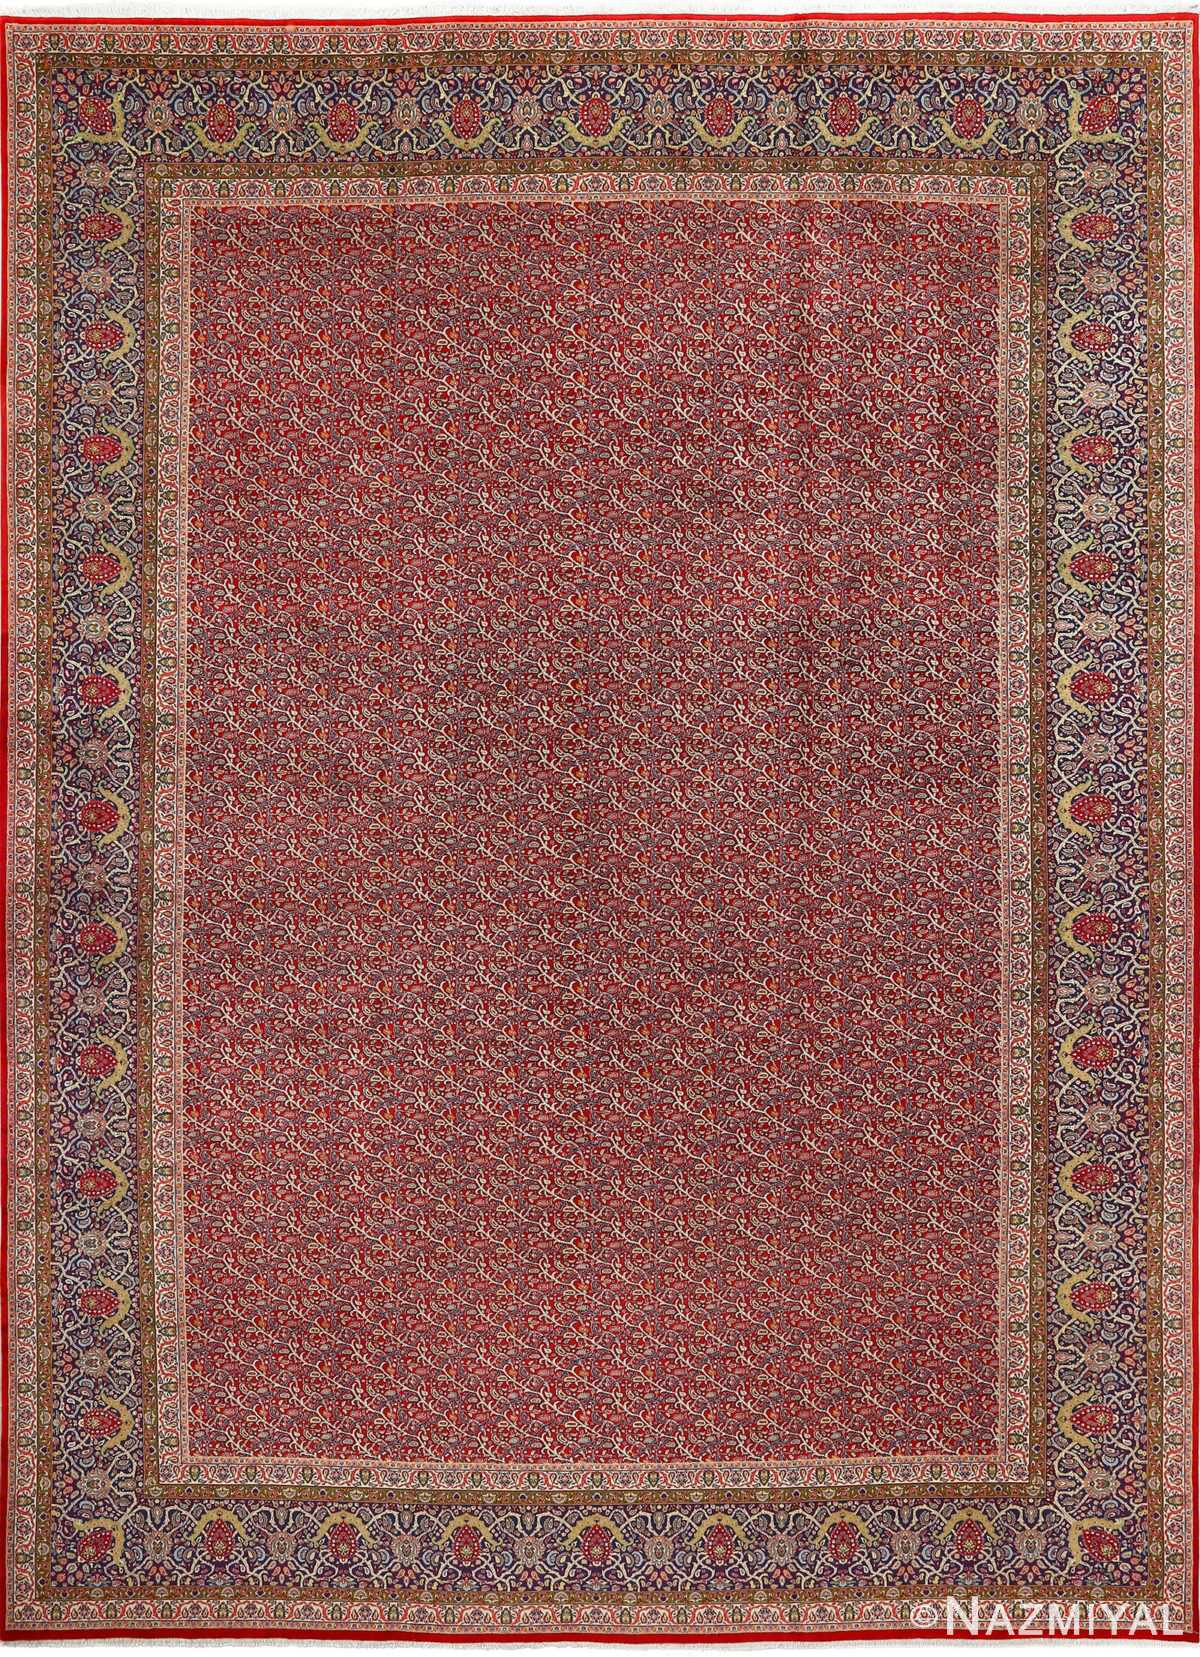 fine kork vintage tabriz persian rug 51041 Nazmiyal